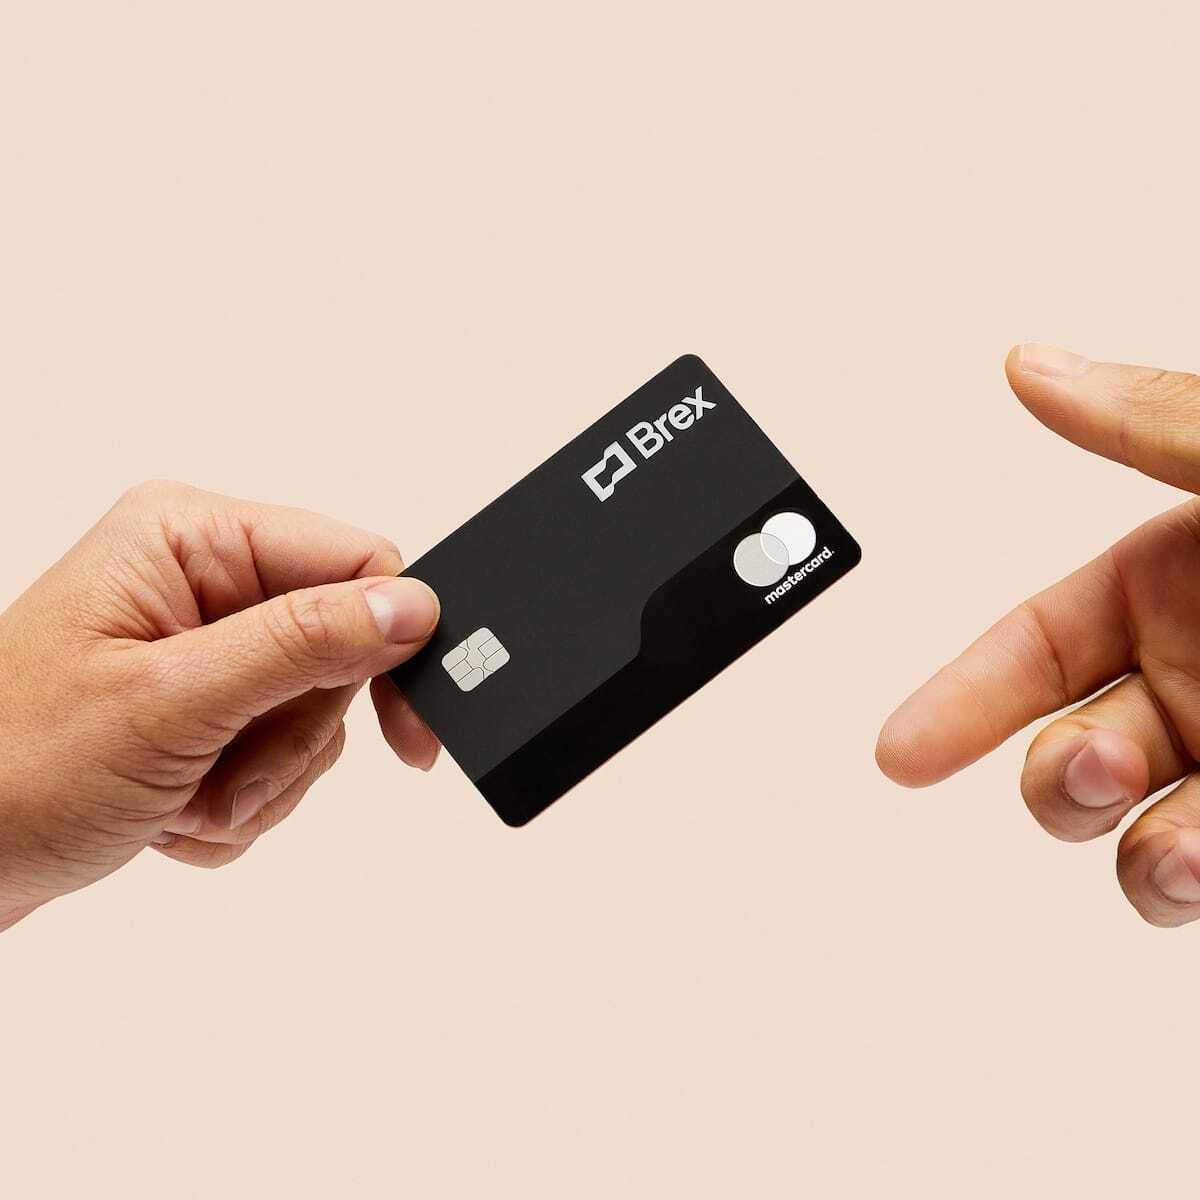 holding brex card